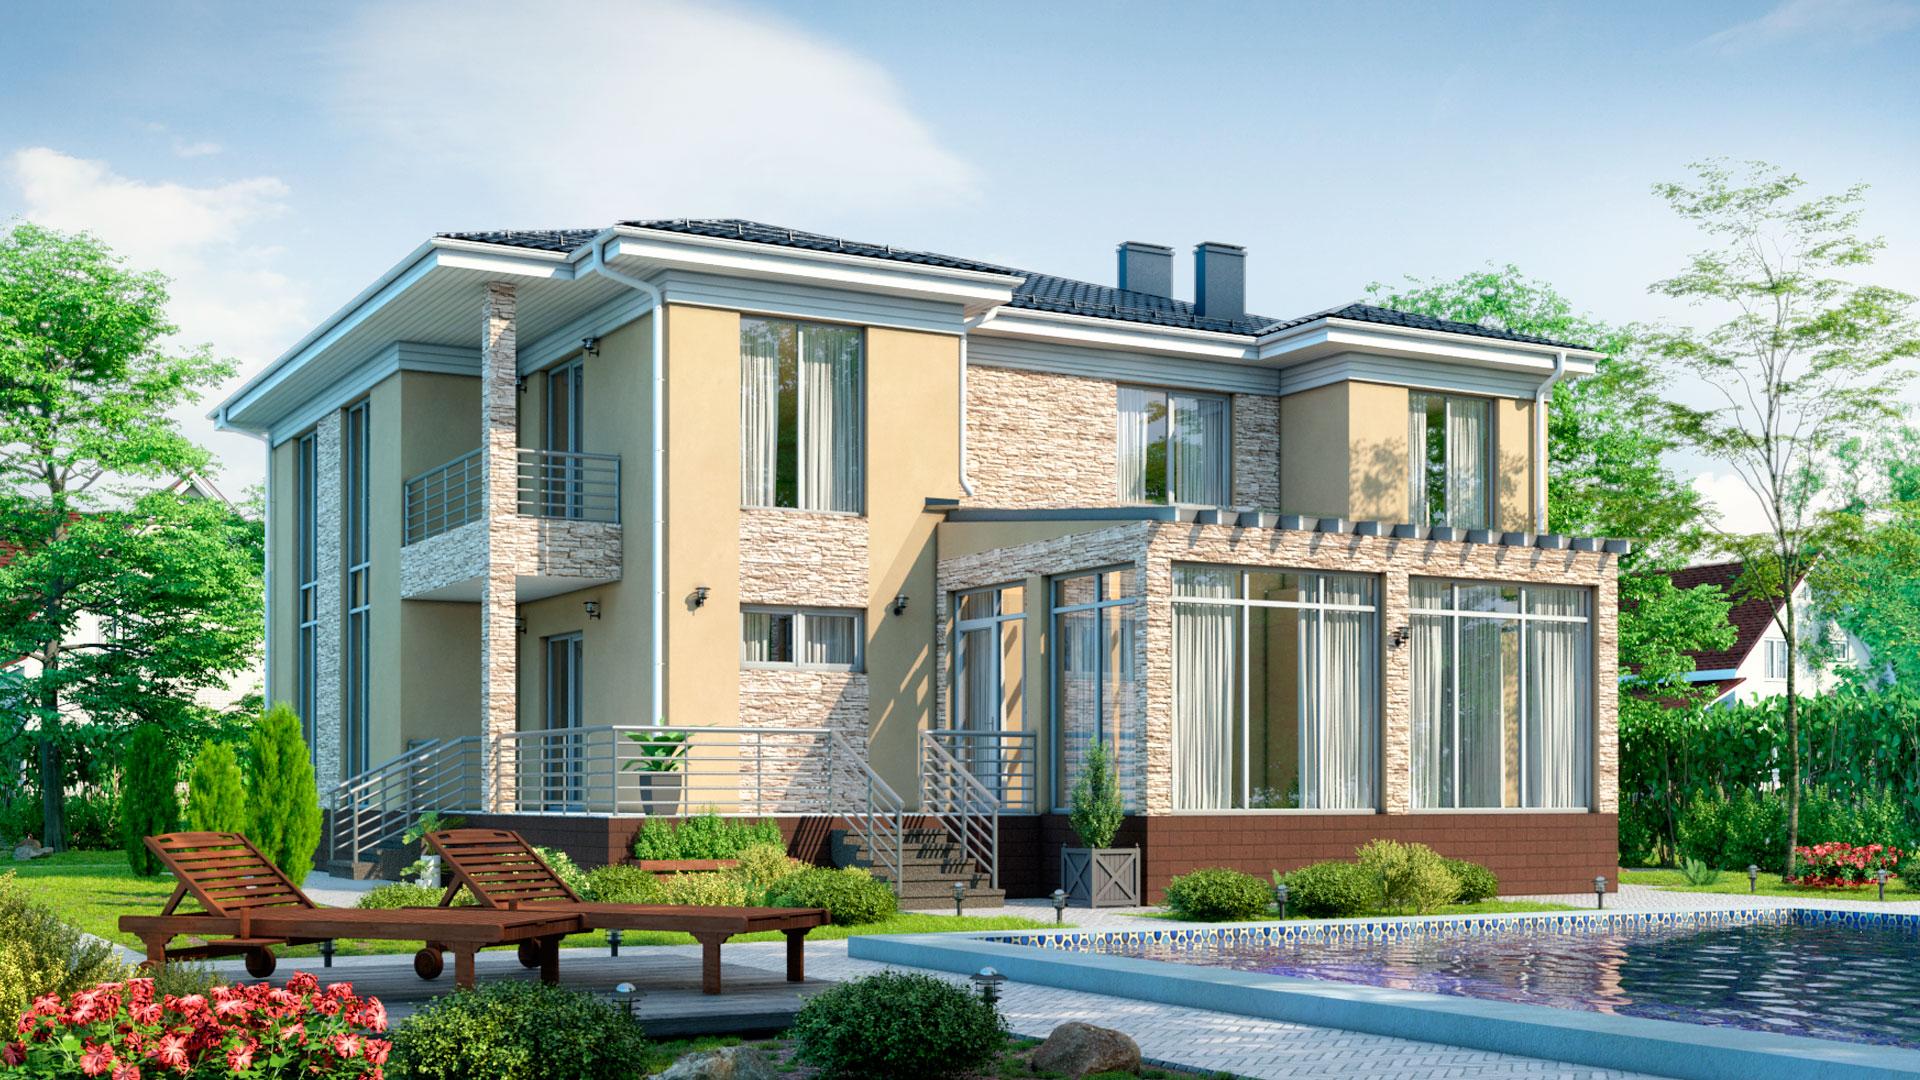 Задний фасад загородного дома с большими окнами, проект БЭНПАН БП-338.